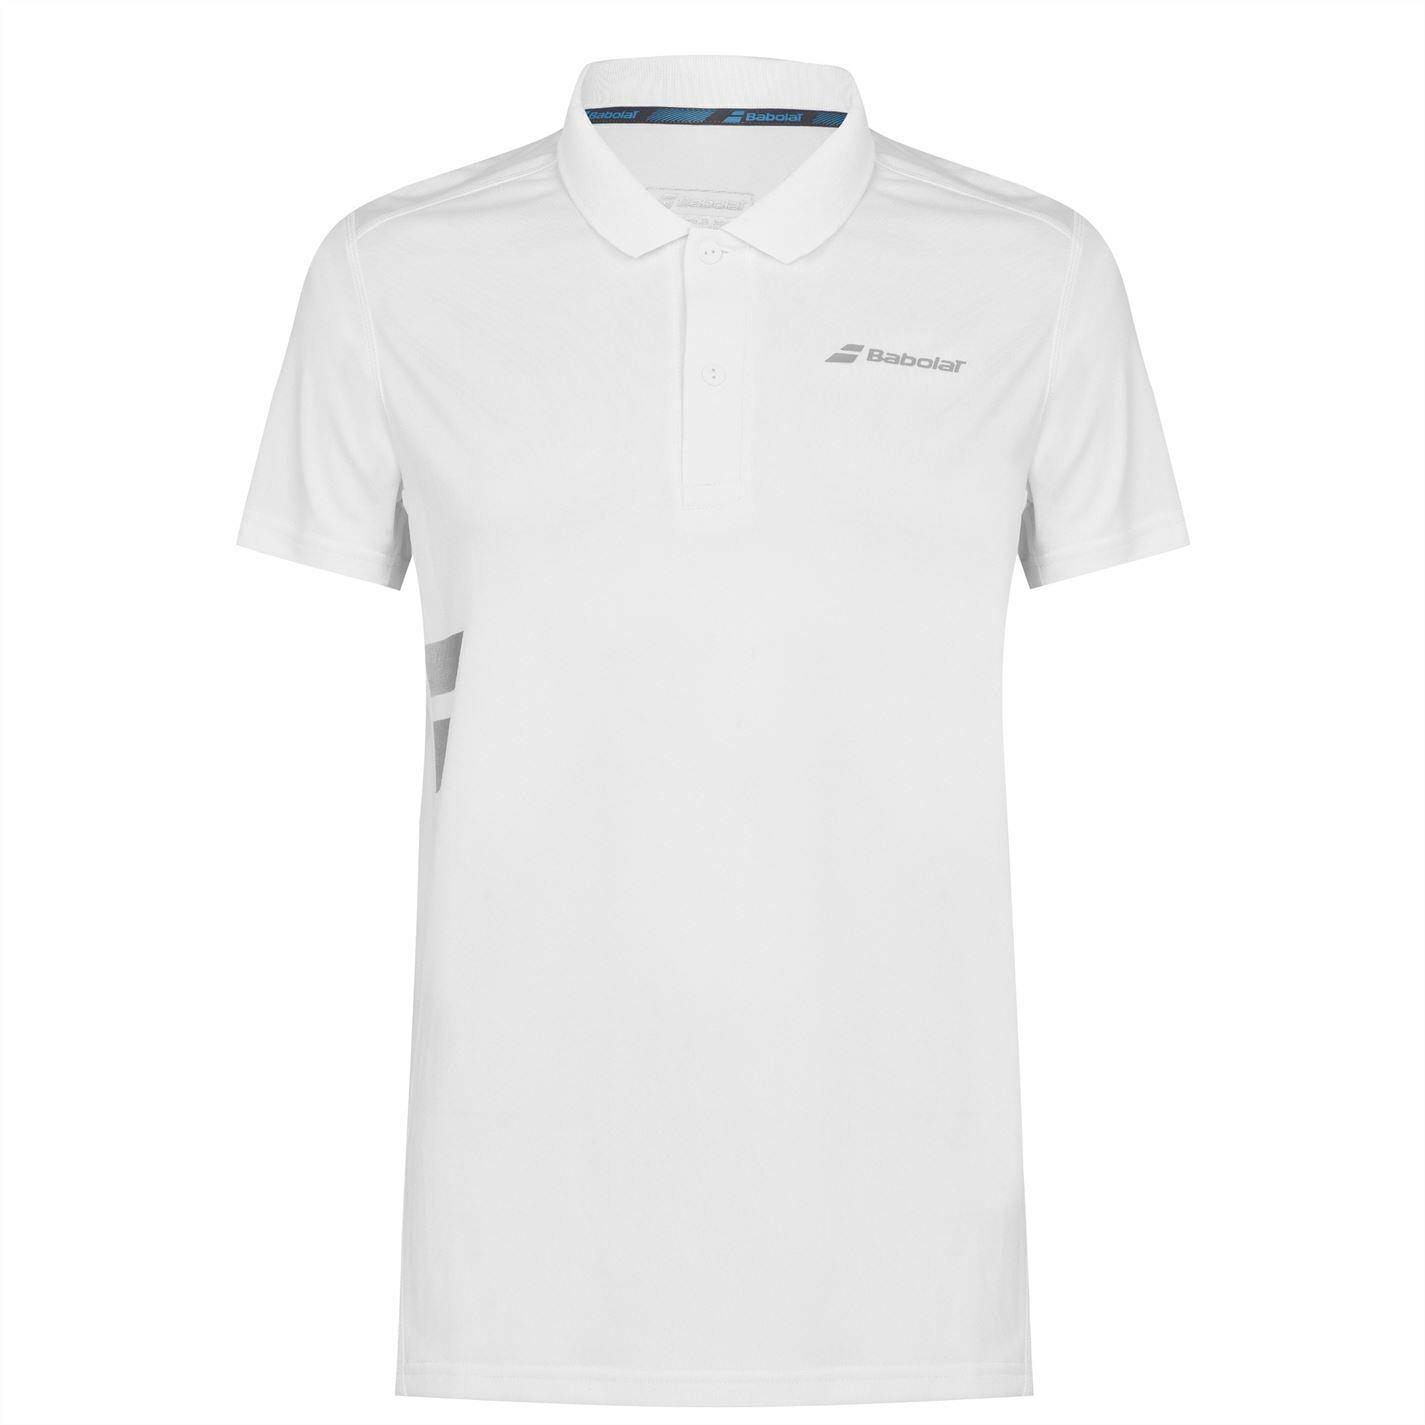 Babolat Mens Polo Shirt Short Sleeve Performance Tee Top Button Placket Tonal